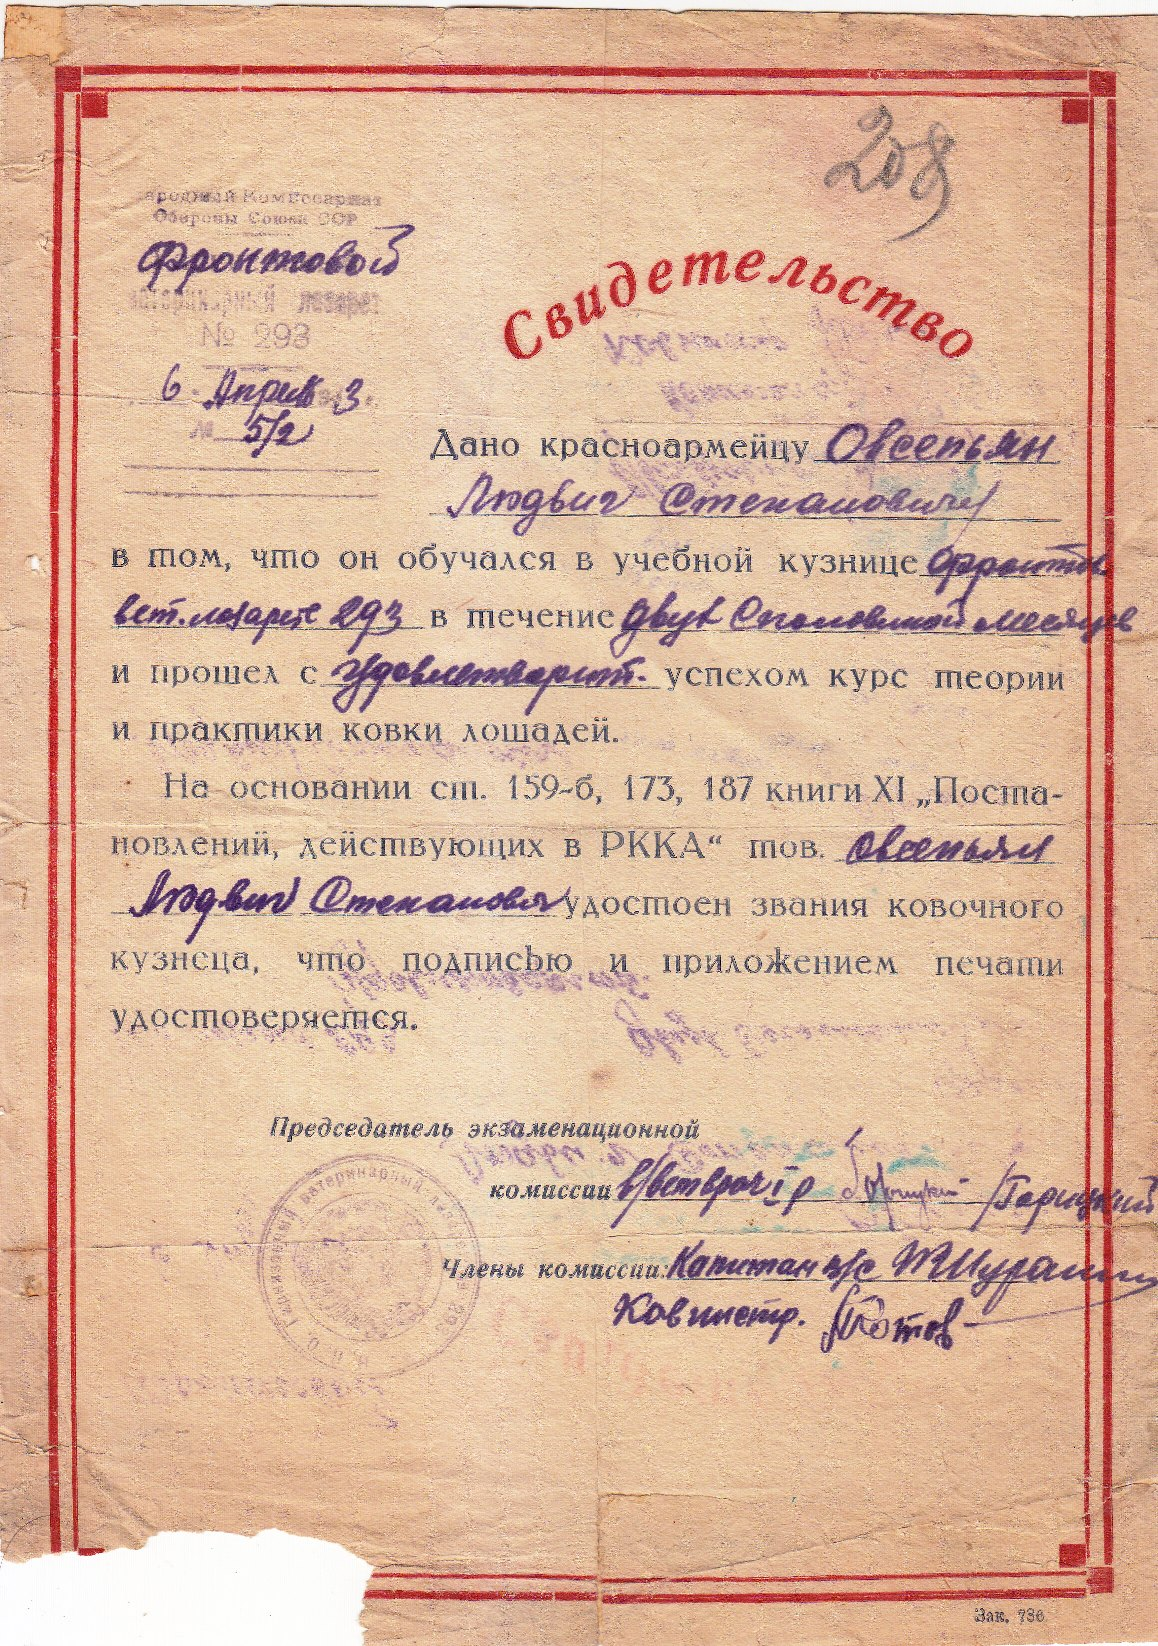 http://www.djavdett.ru/products_pictures/IMGgr.jpg